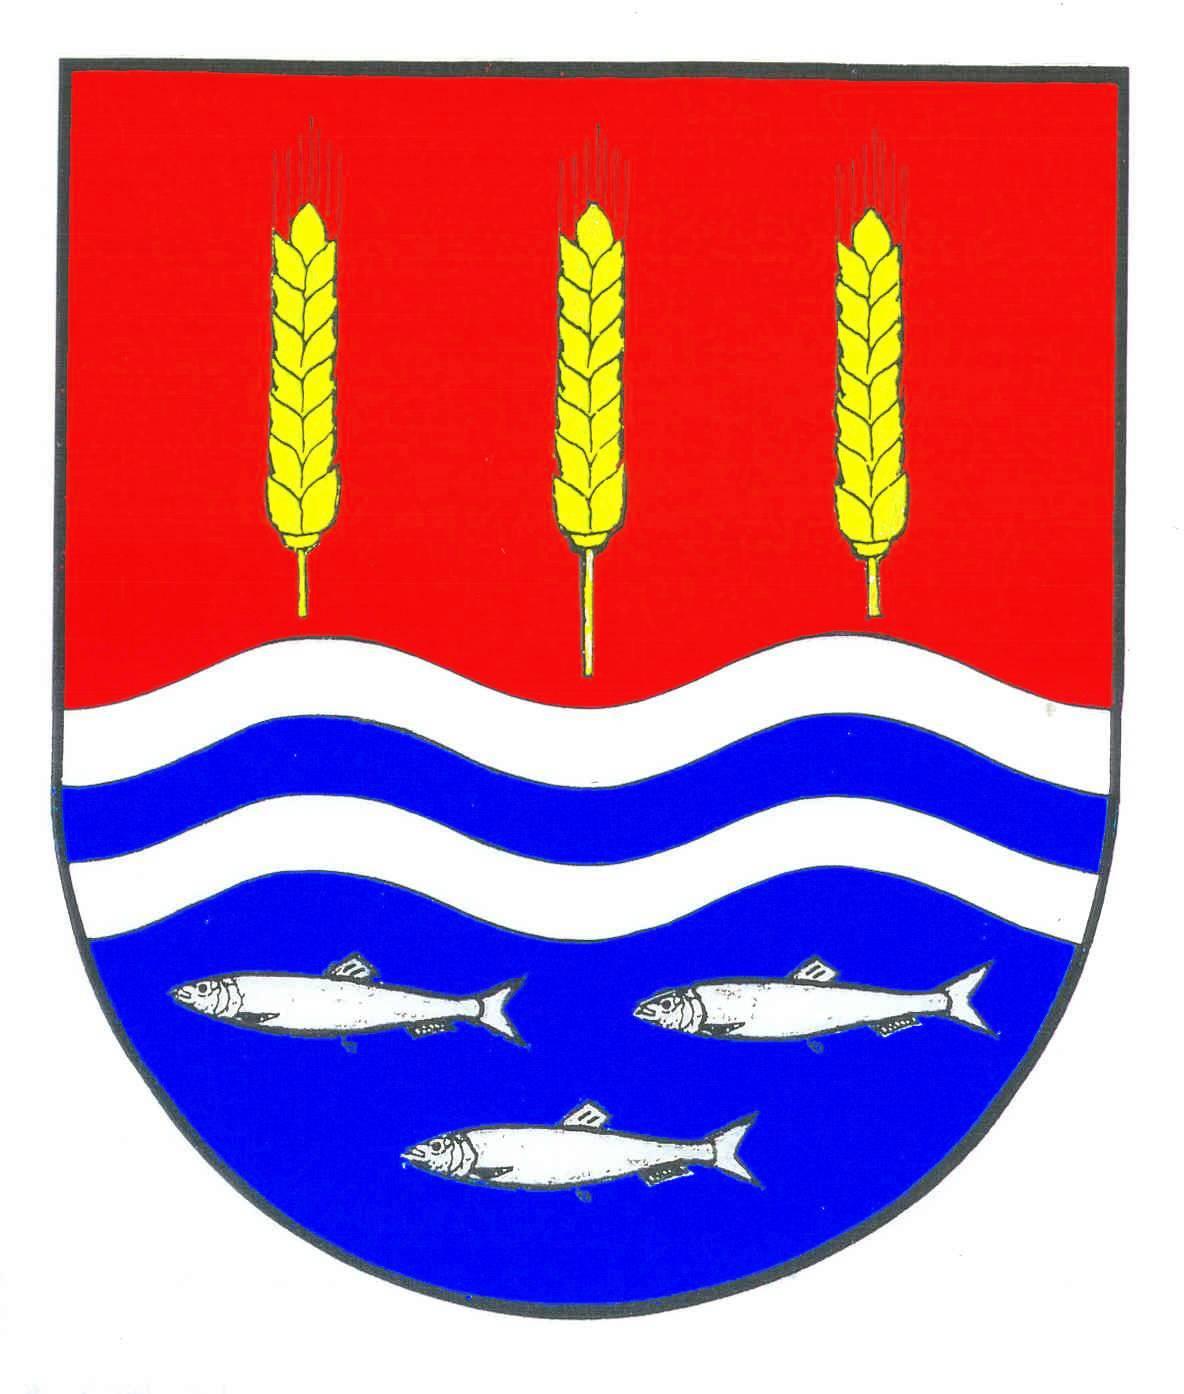 Wappen GemeindeThumby, Kreis Rendsburg-Eckernförde